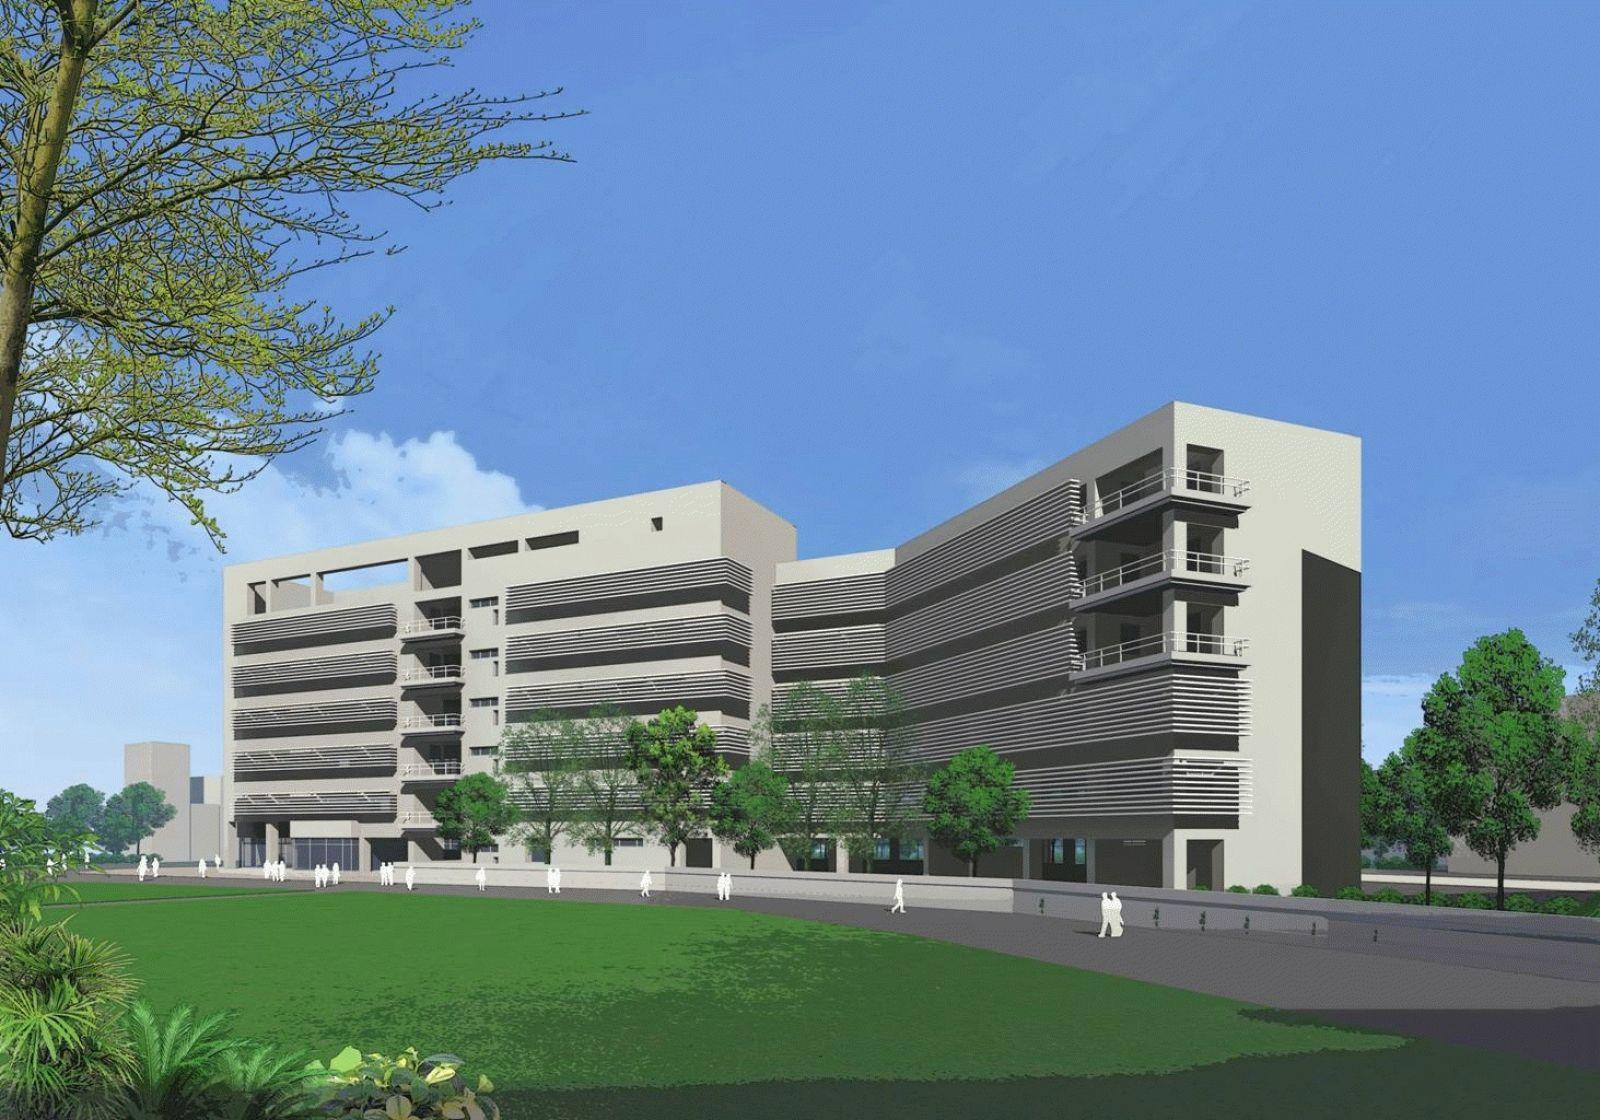 Life science building of national ocean university